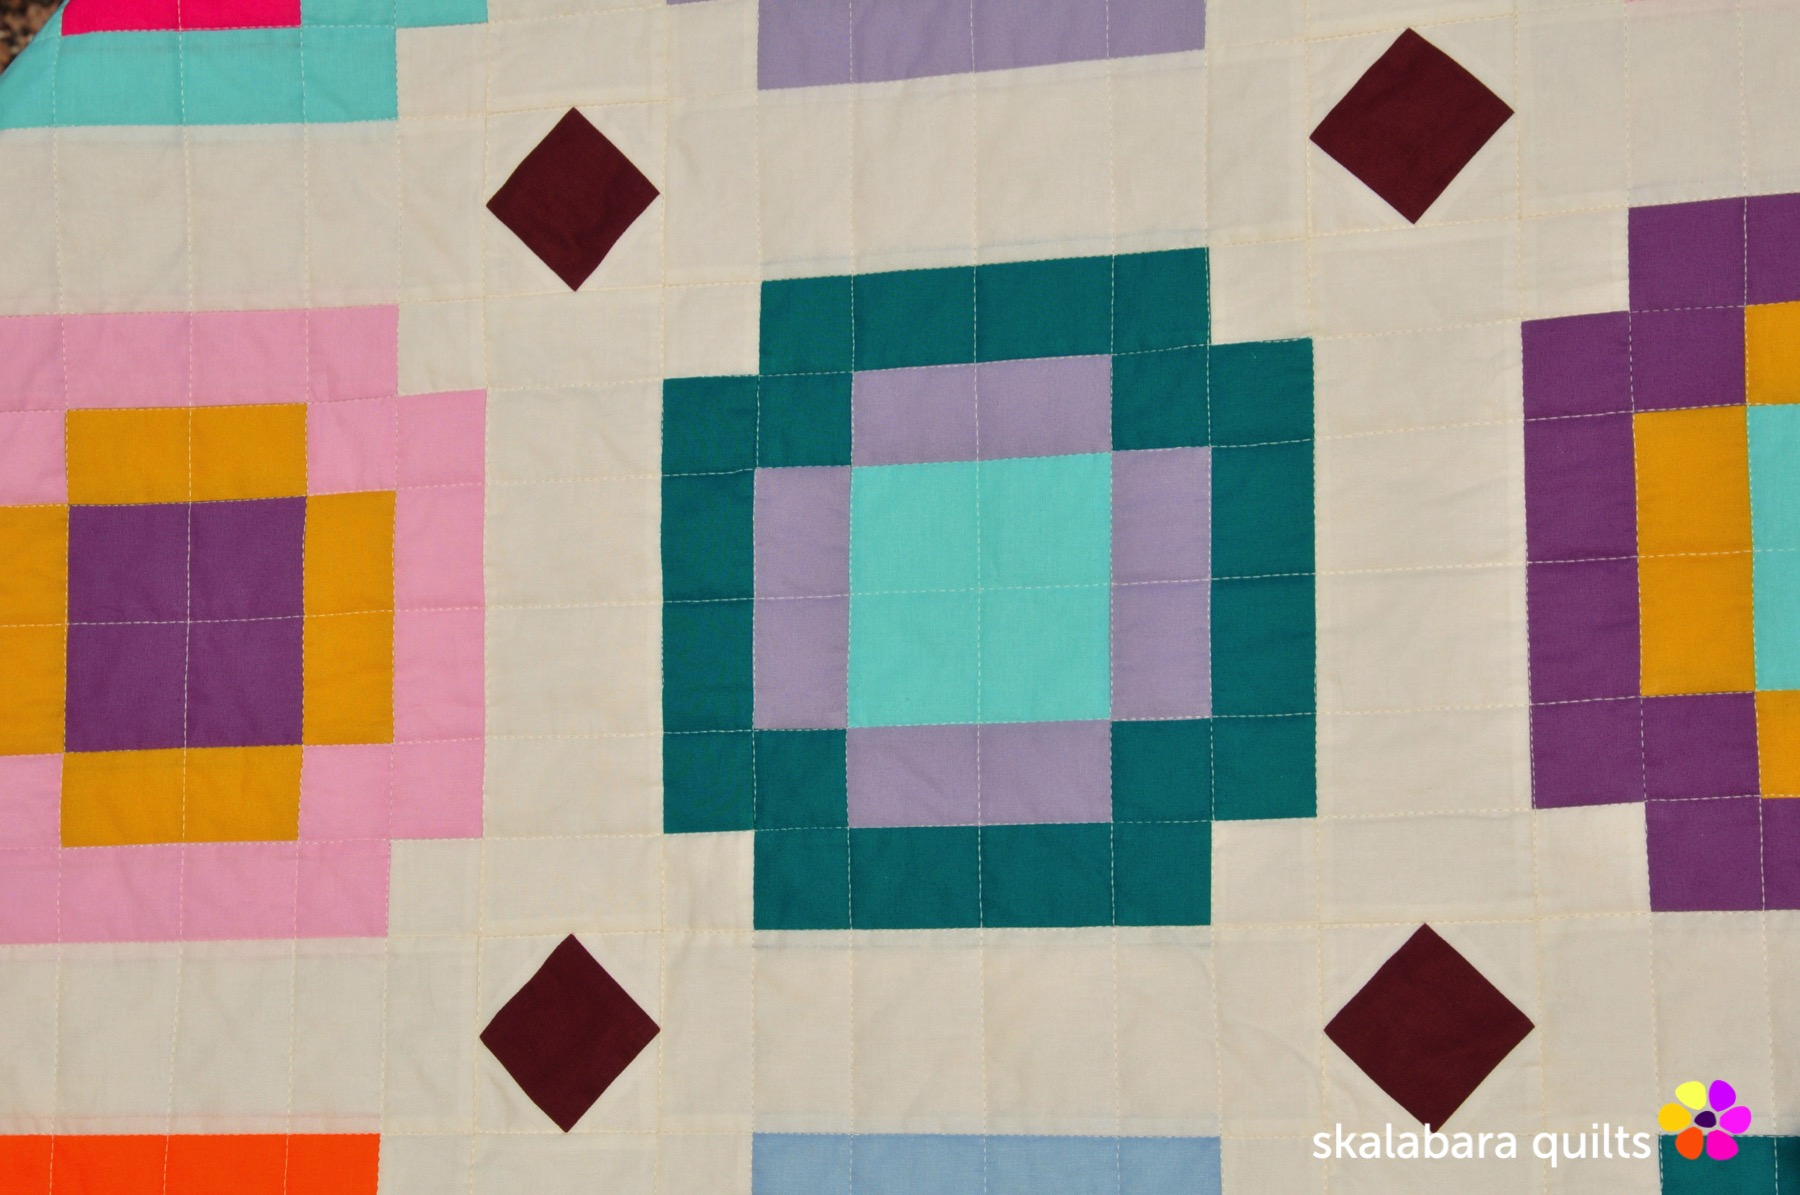 radiate quilt detail 3 - skalabara quilts